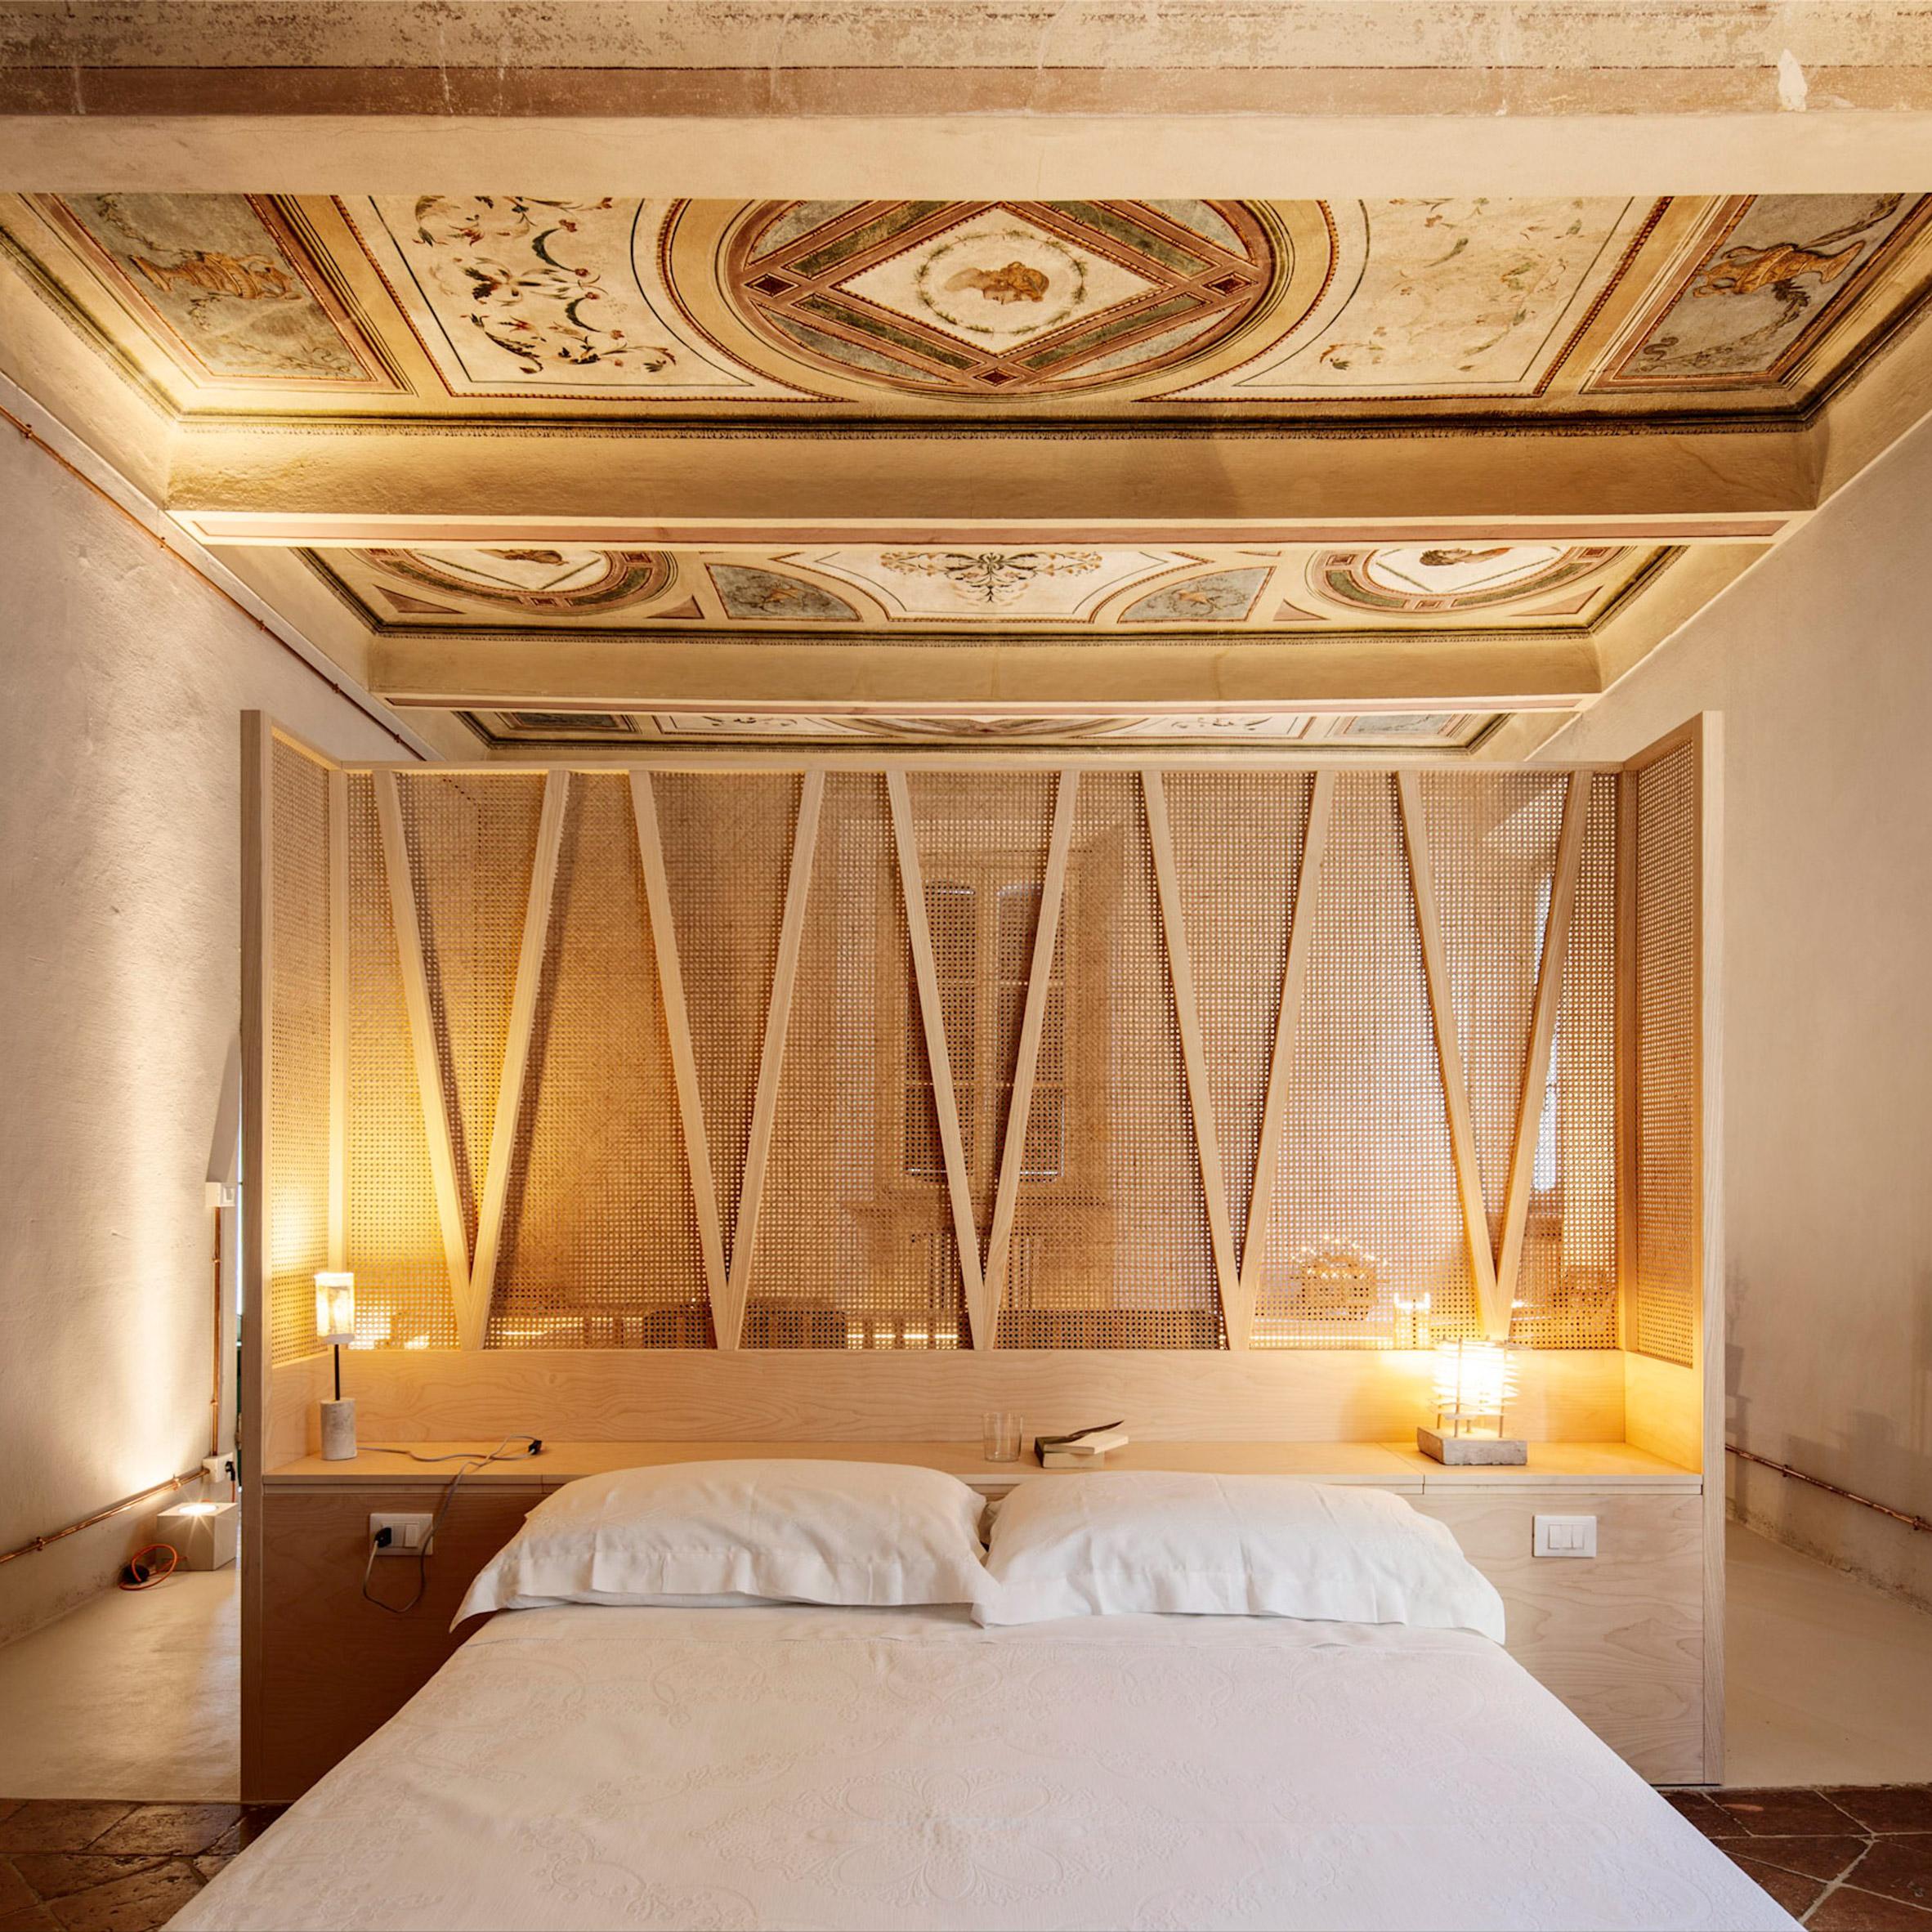 Hotels in Italy: Appartamento Brolettuono by Archiplanstudio